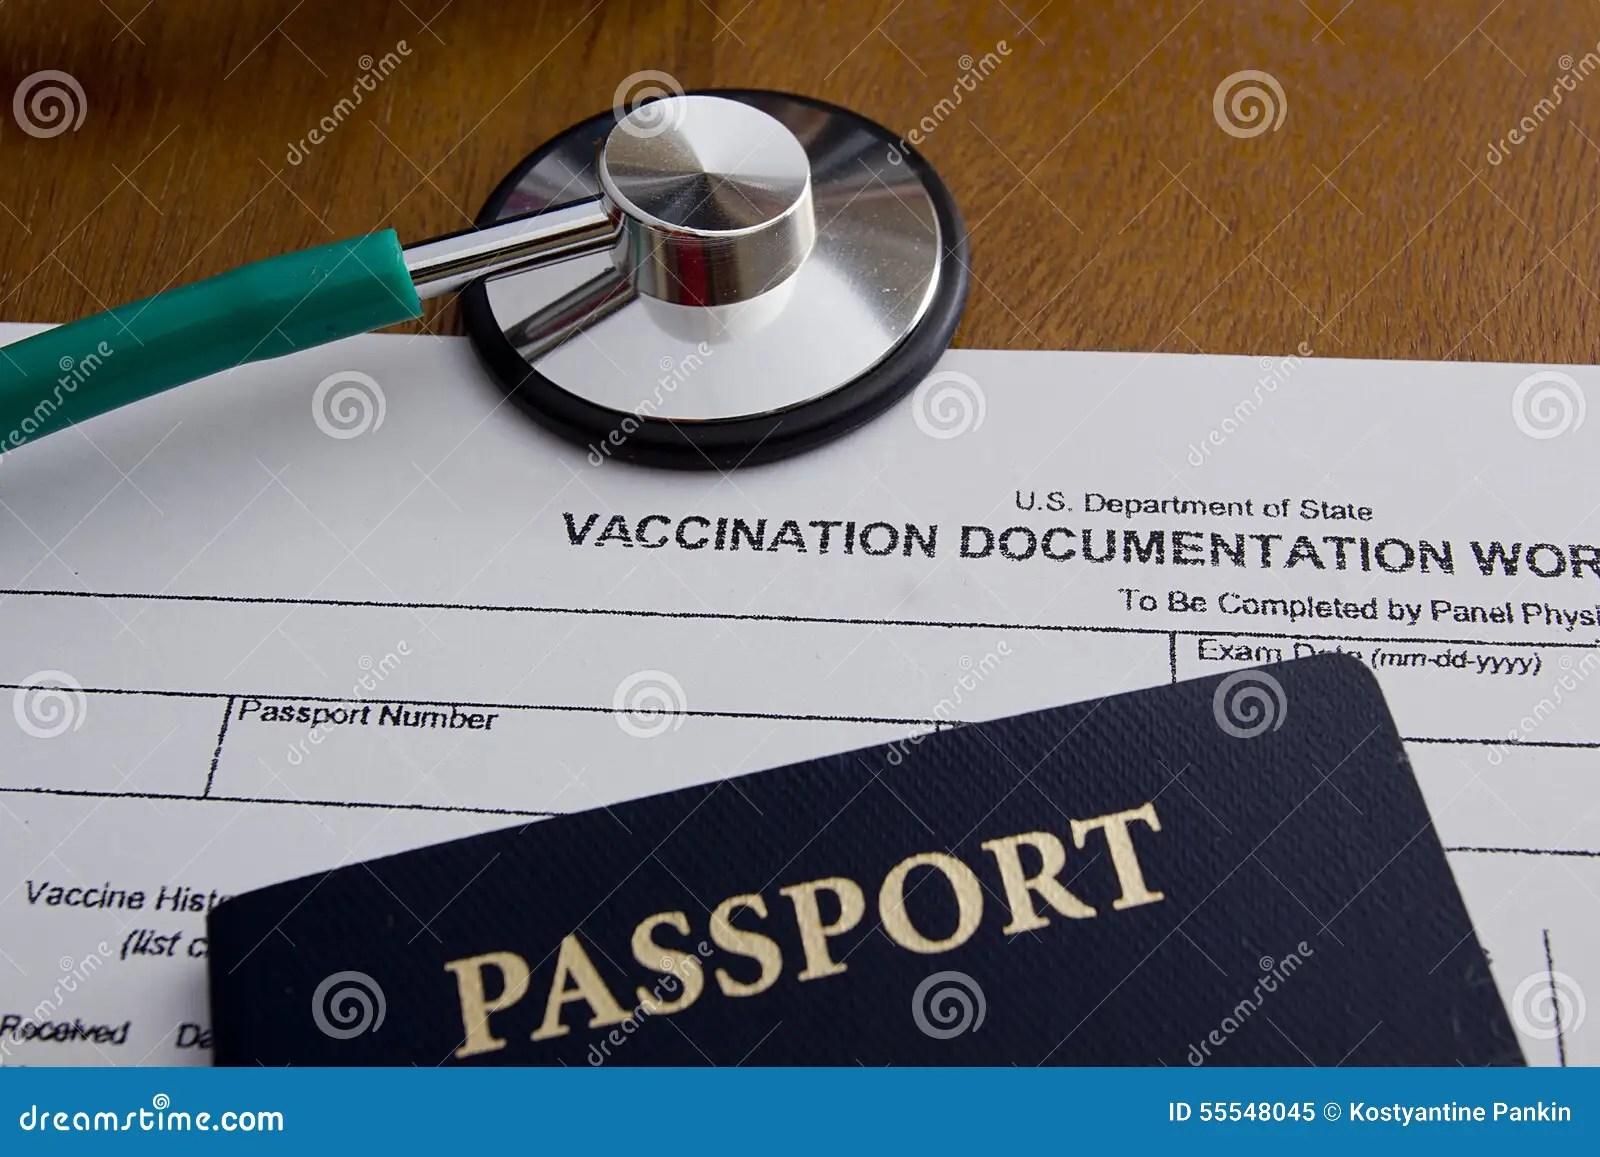 Vaccination Documentation Worksheet Stock Image